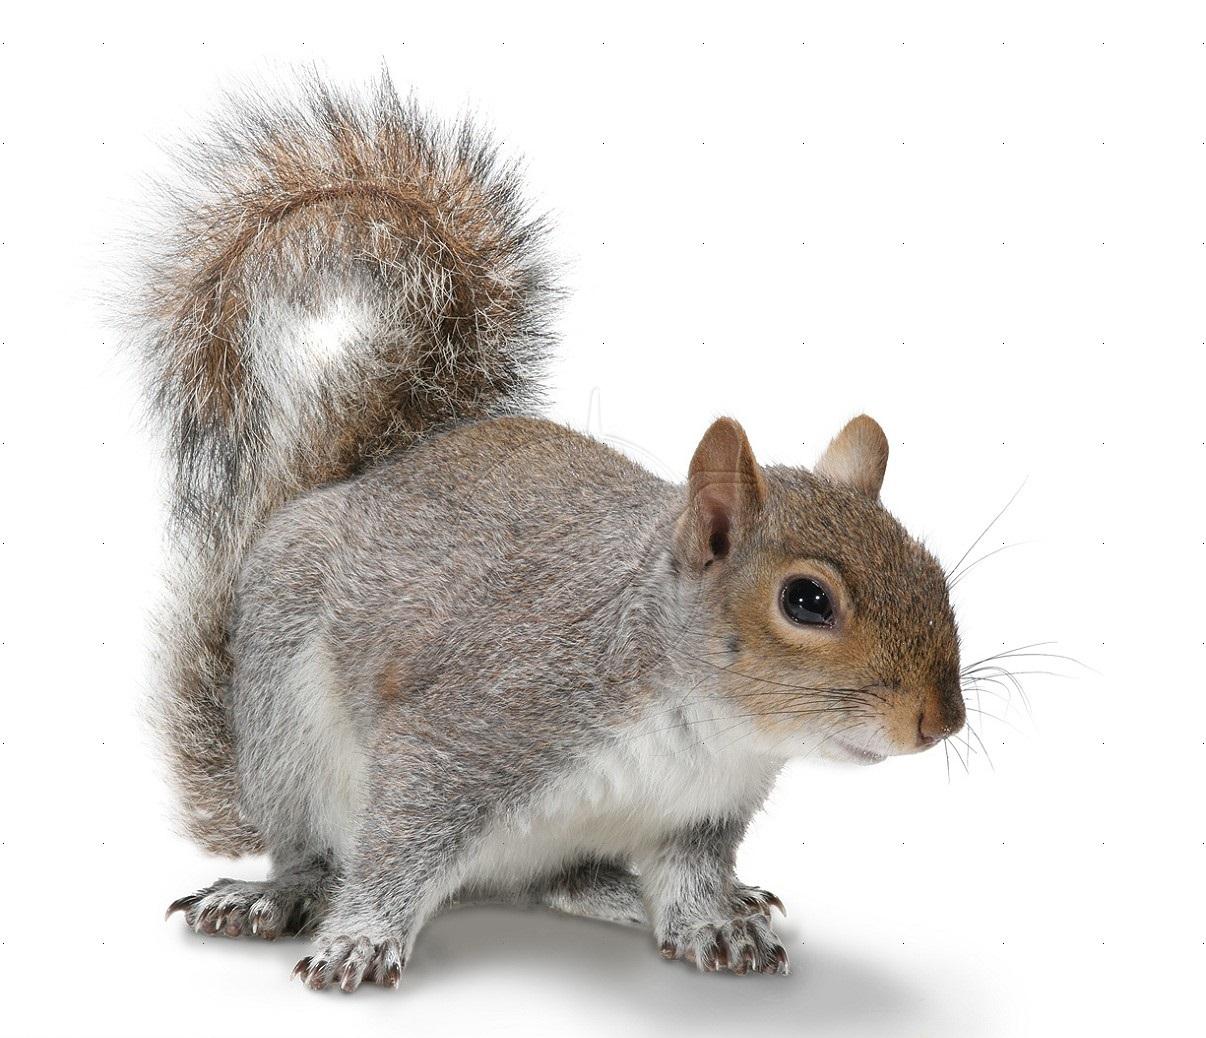 gray squirrel wallpaper - photo #17